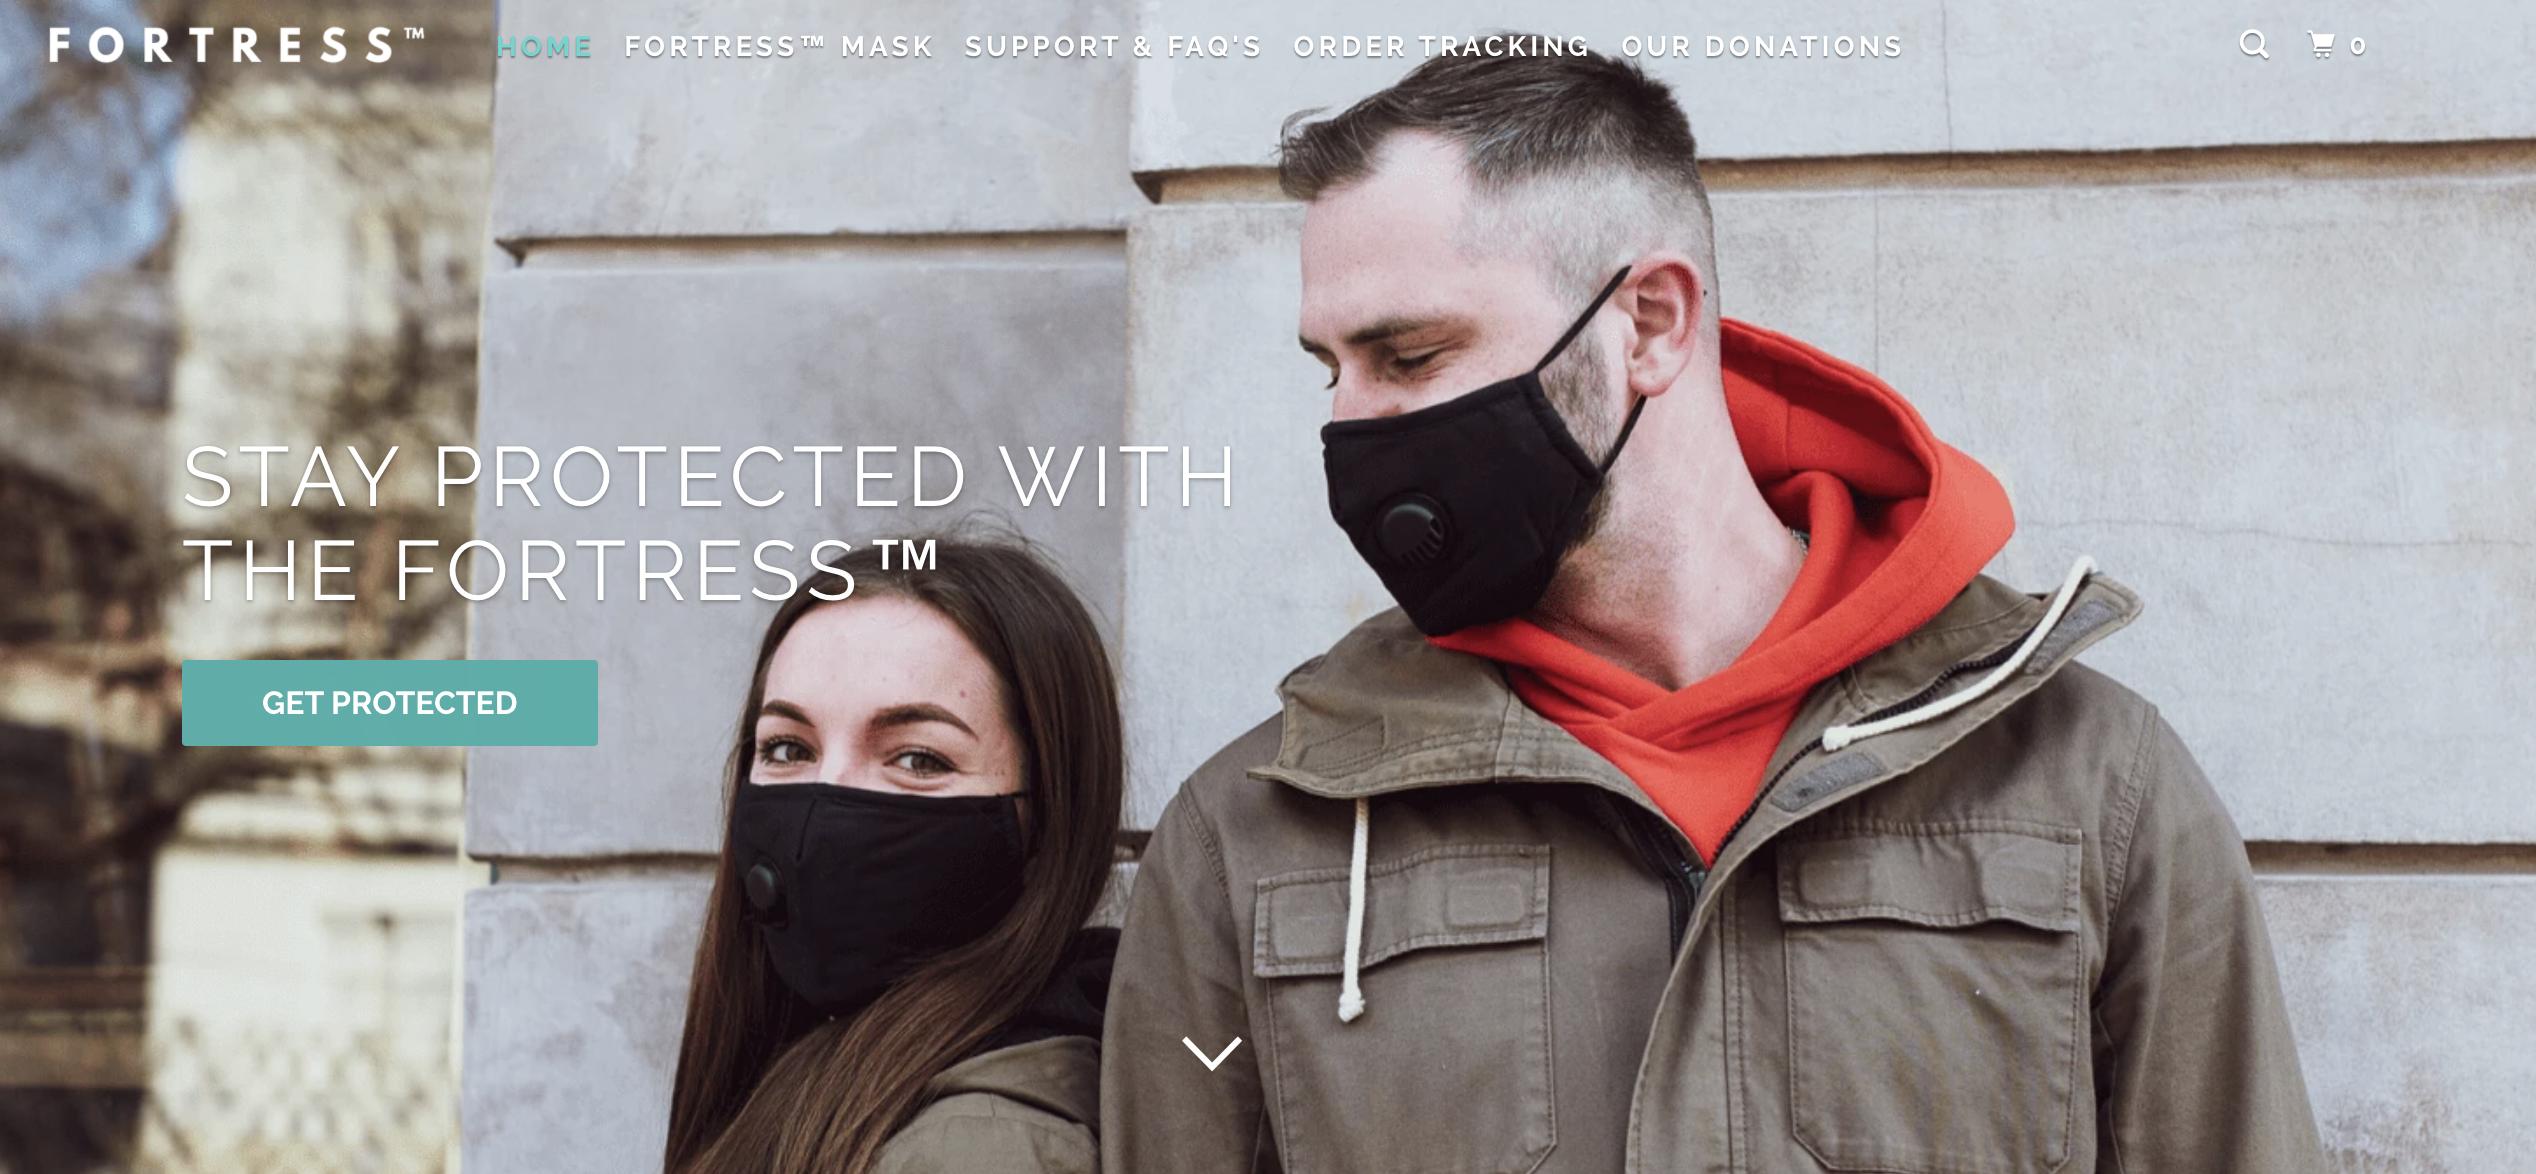 Fortressmask.com Review - Scam or Legit Mask Shop?